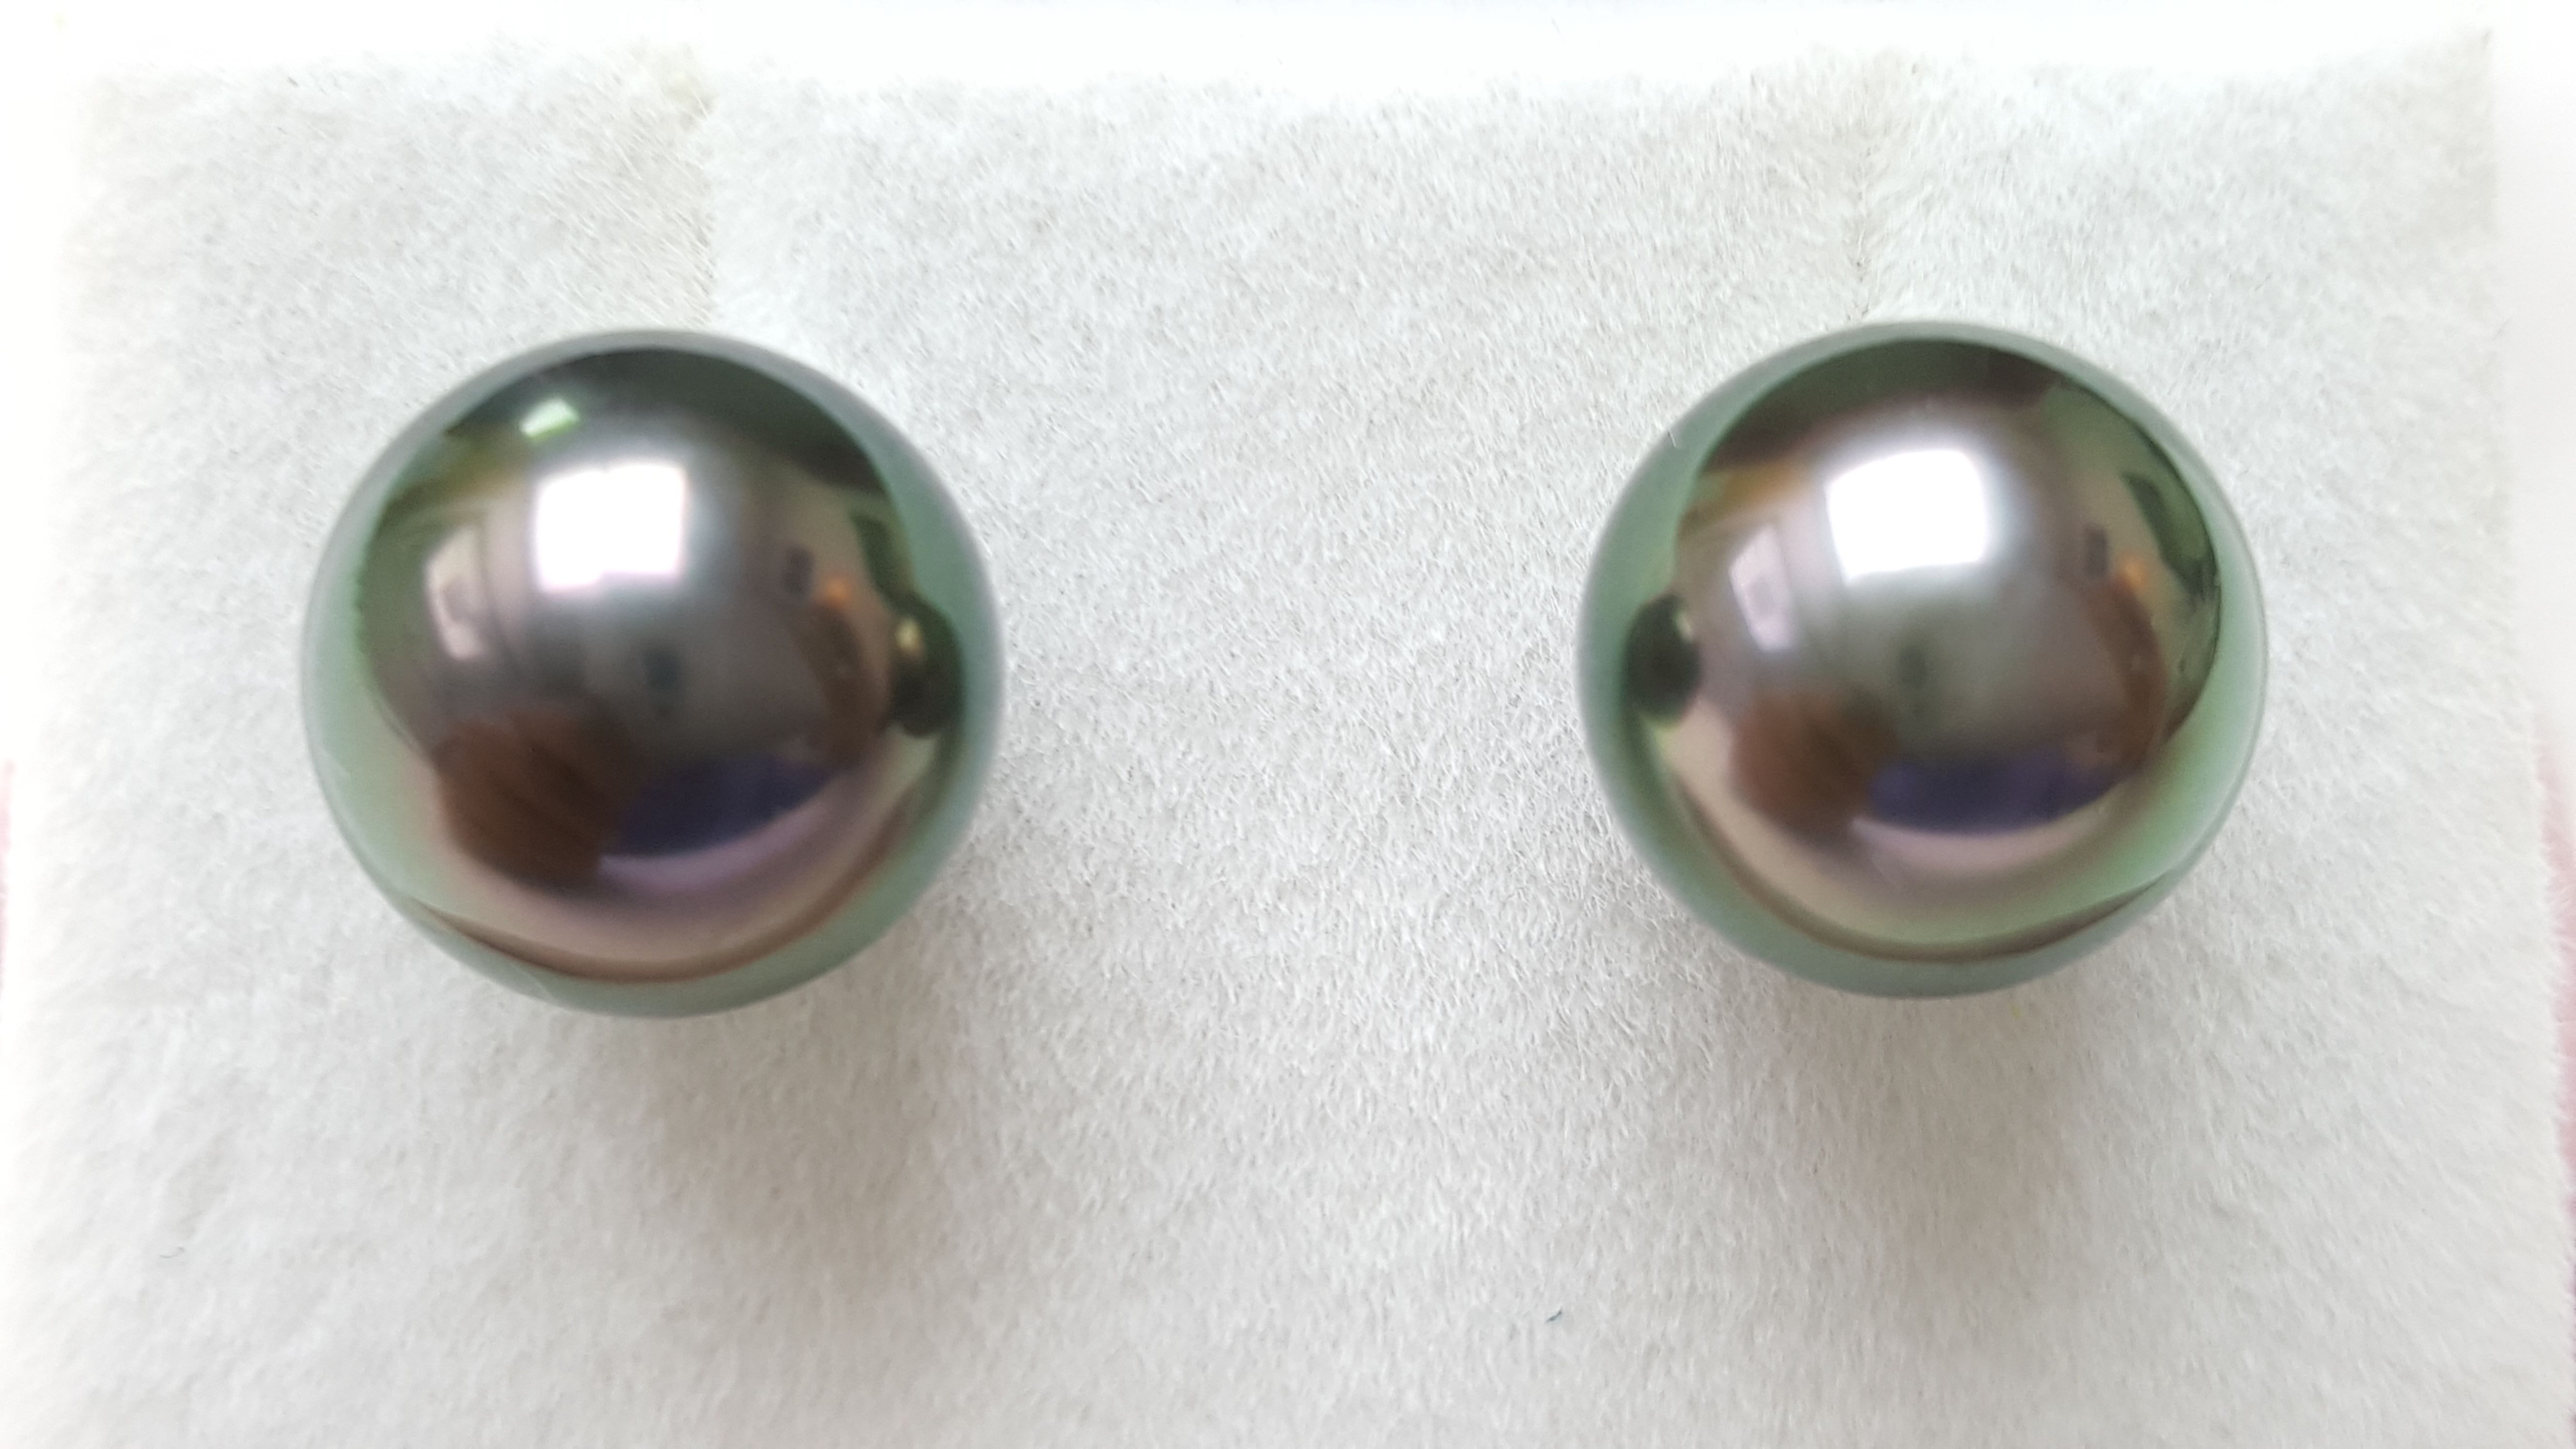 Product Details Tahitian Sea Pearl / South Sea Pearl Earring.  Grade: AAA1 Size: 10mm Shape: Perfect Round Colour: Natural rare peacock. Material: 18K stud  Final Price: HK$2,800/.pair Retail Price: HK$5,000 - $7,500/pair or more.  http://pearlforprincess.com/  #Hong #Kong #Peacock #10mm #Earring #Stud